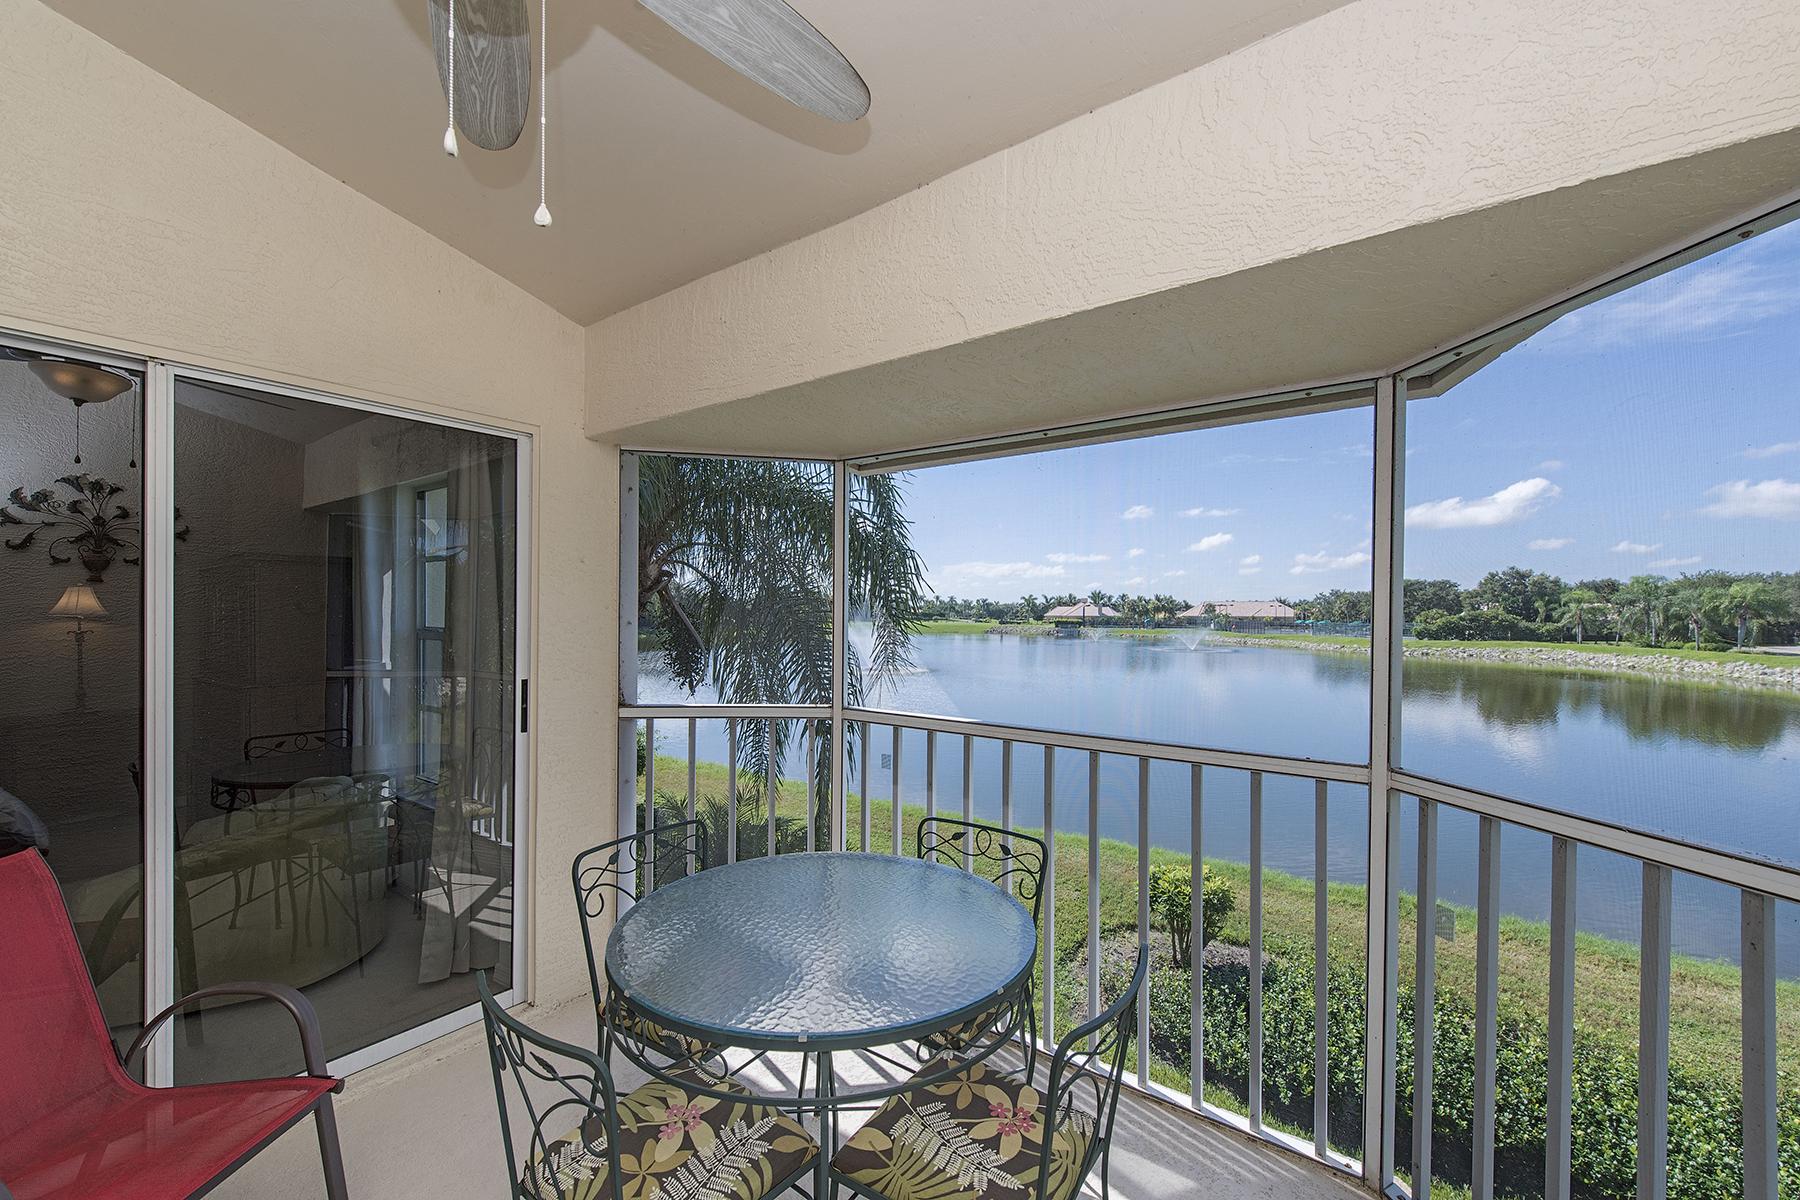 Condominium for Sale at WORTHINGTON 13640 Worthington Way 1911 Bonita Springs, Florida, 34135 United States